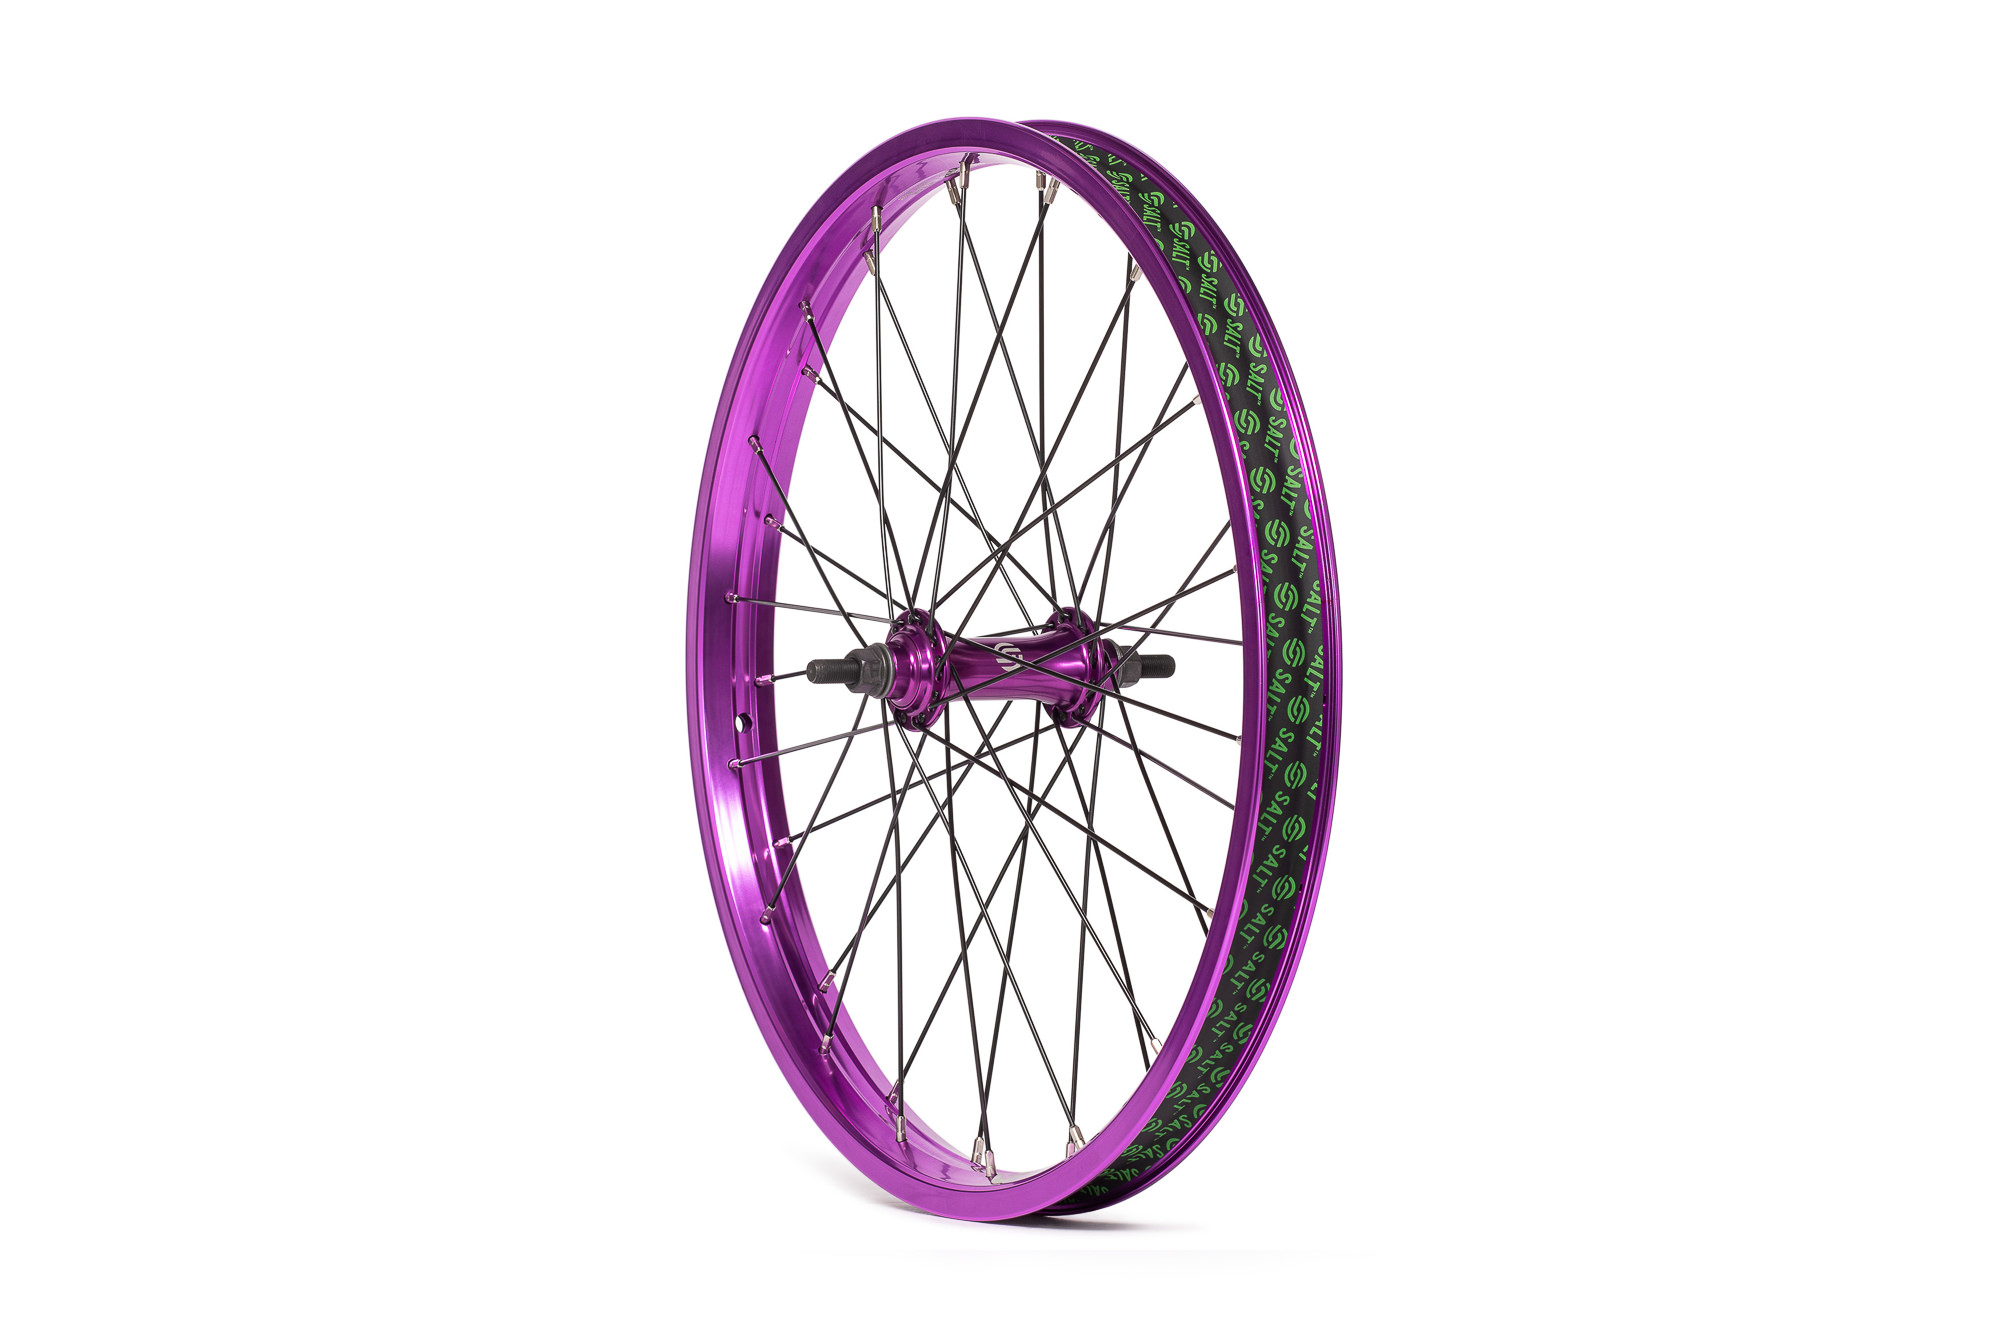 Salt_Everest_front_wheel_purple-02